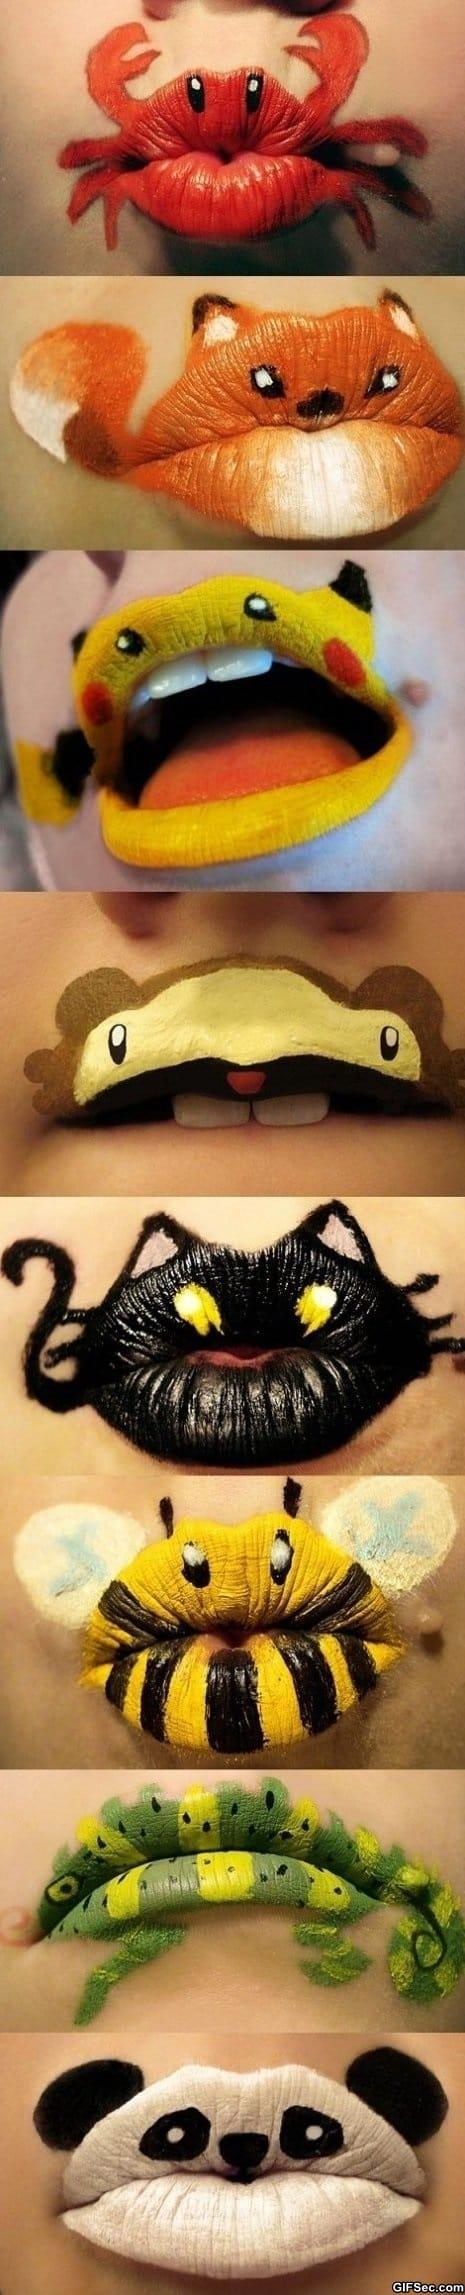 lips-art